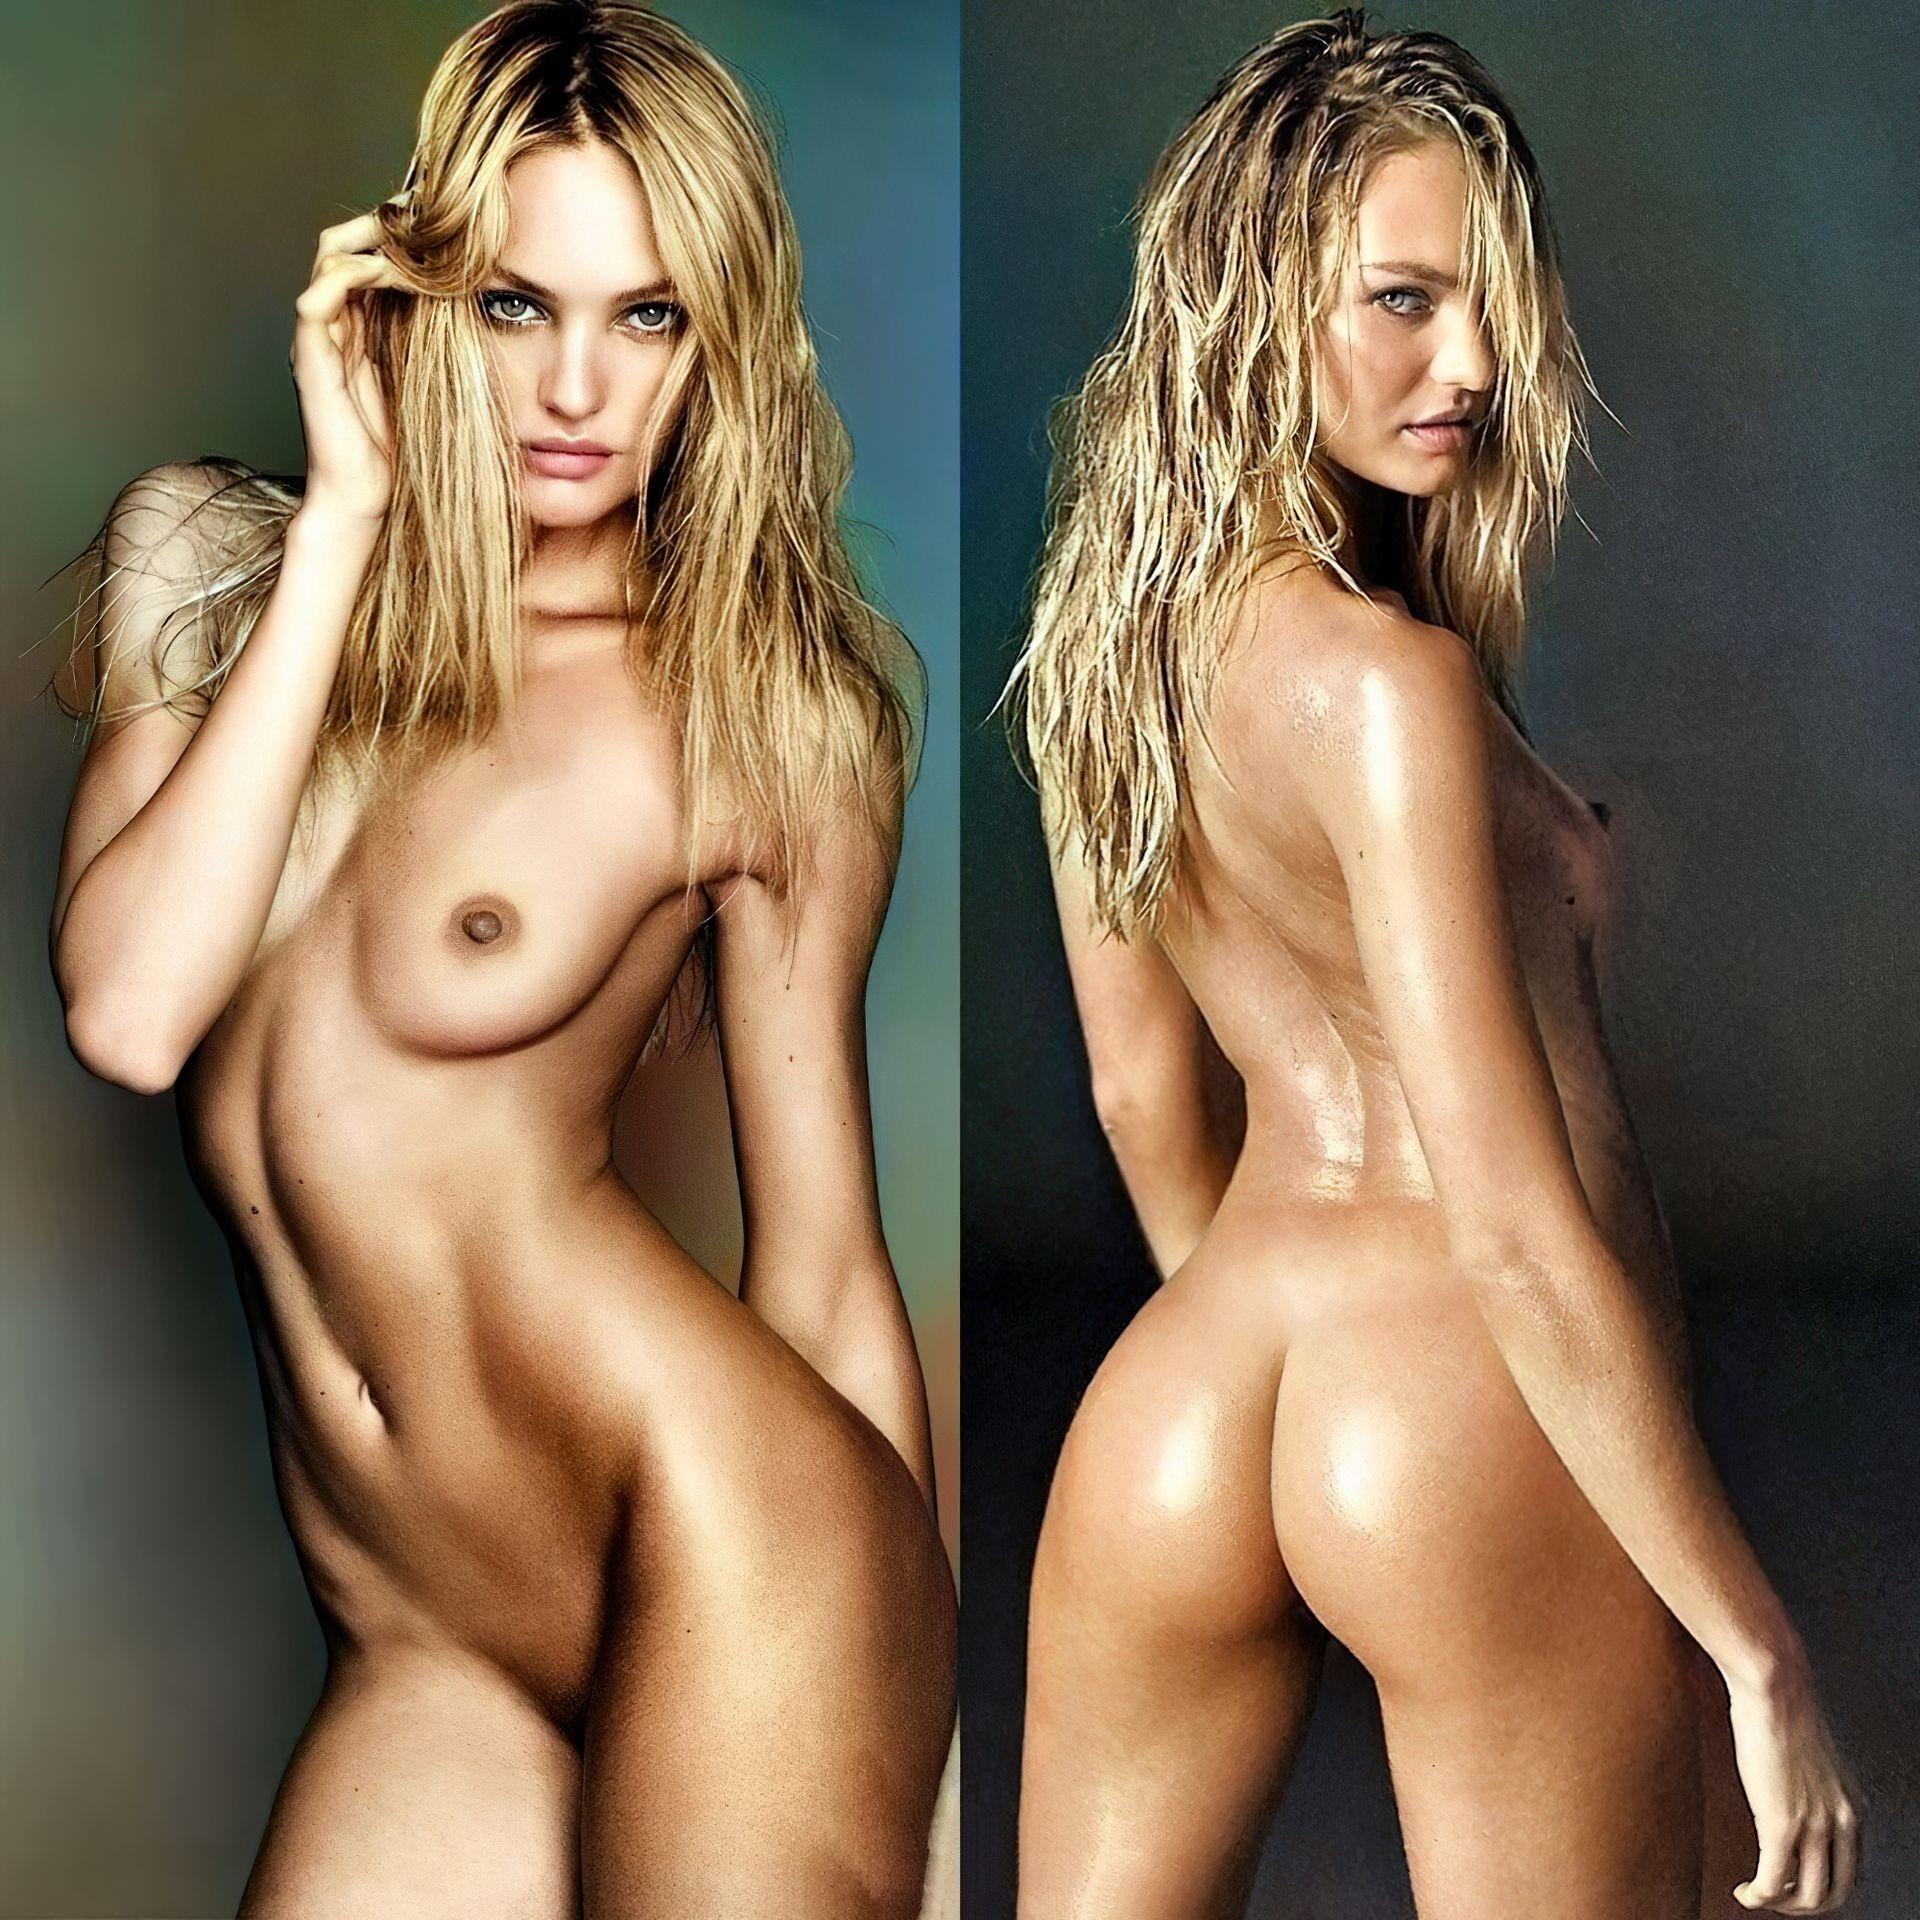 Candice Swanepoel Nude 0001